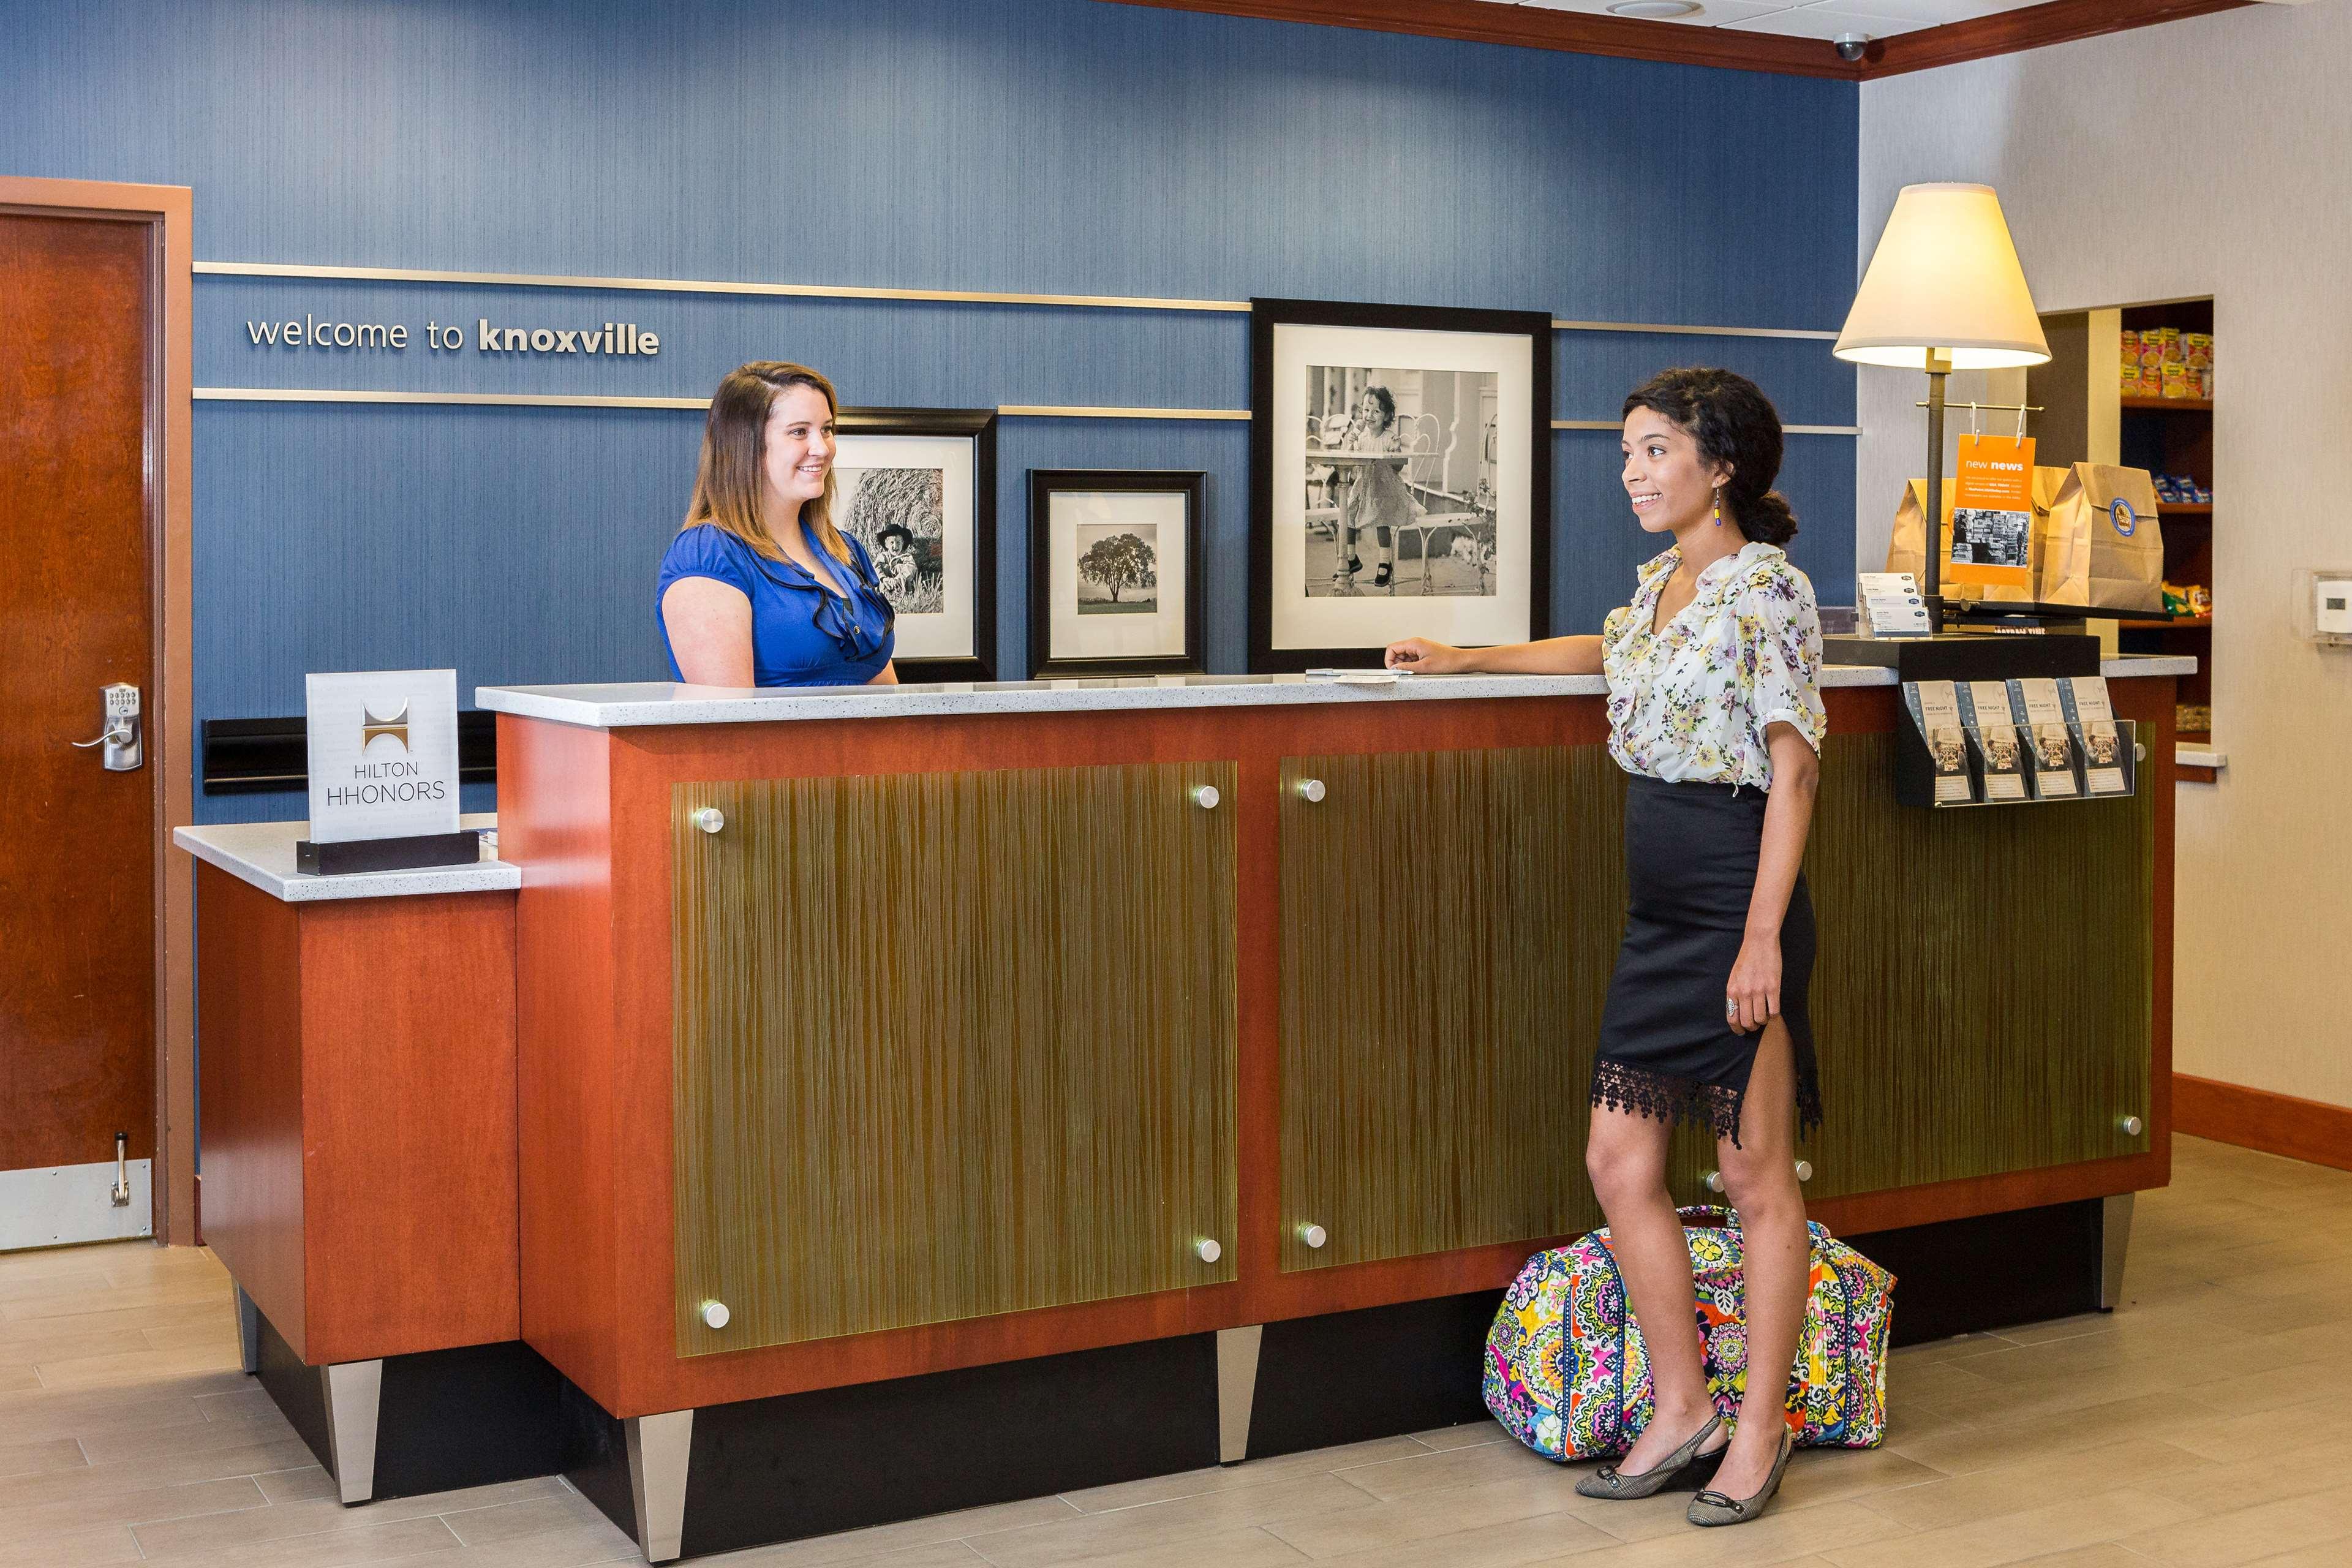 Hampton Inn & Suites Knoxville-Downtown image 8